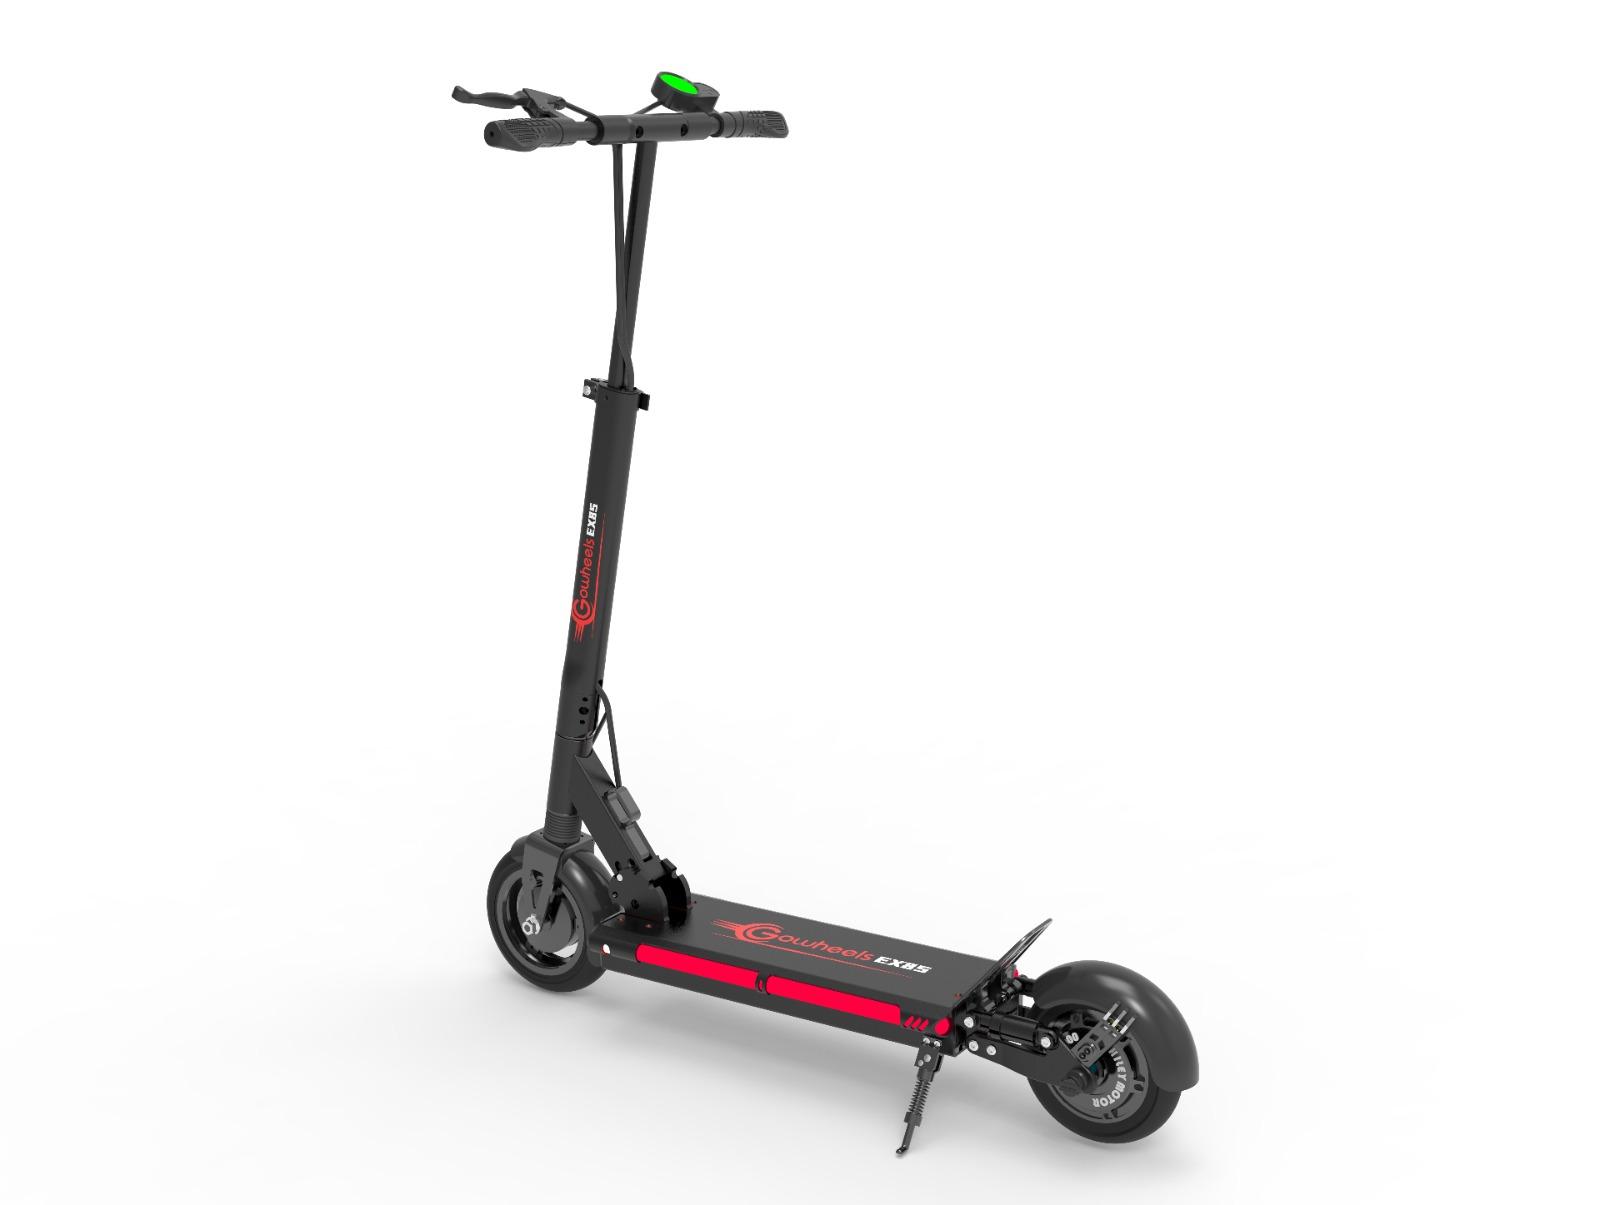 קורקינט חשמלי - Gowheels EX8S 48V